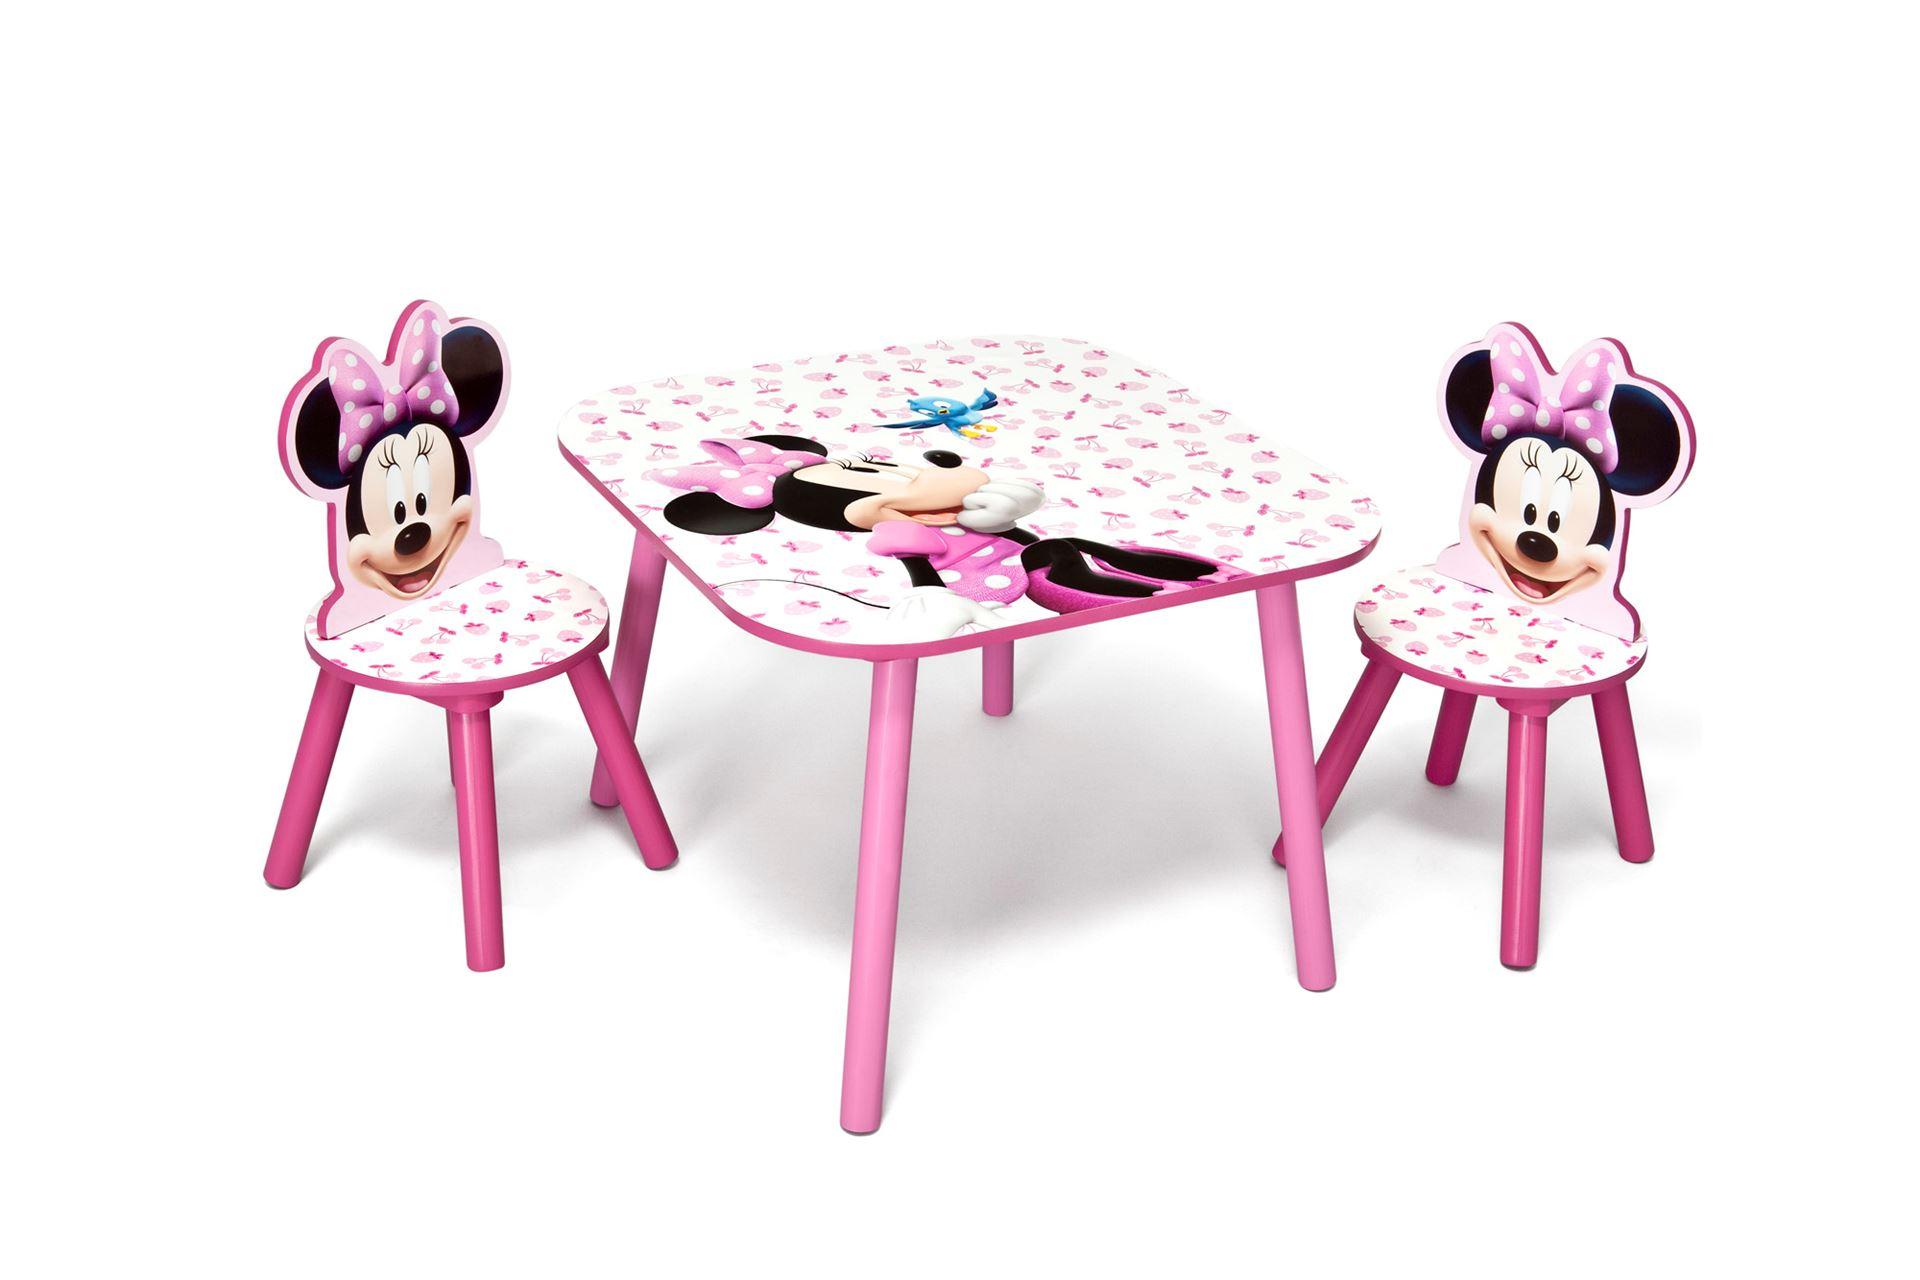 Dětský stůl s židlemi Minnie III Myška